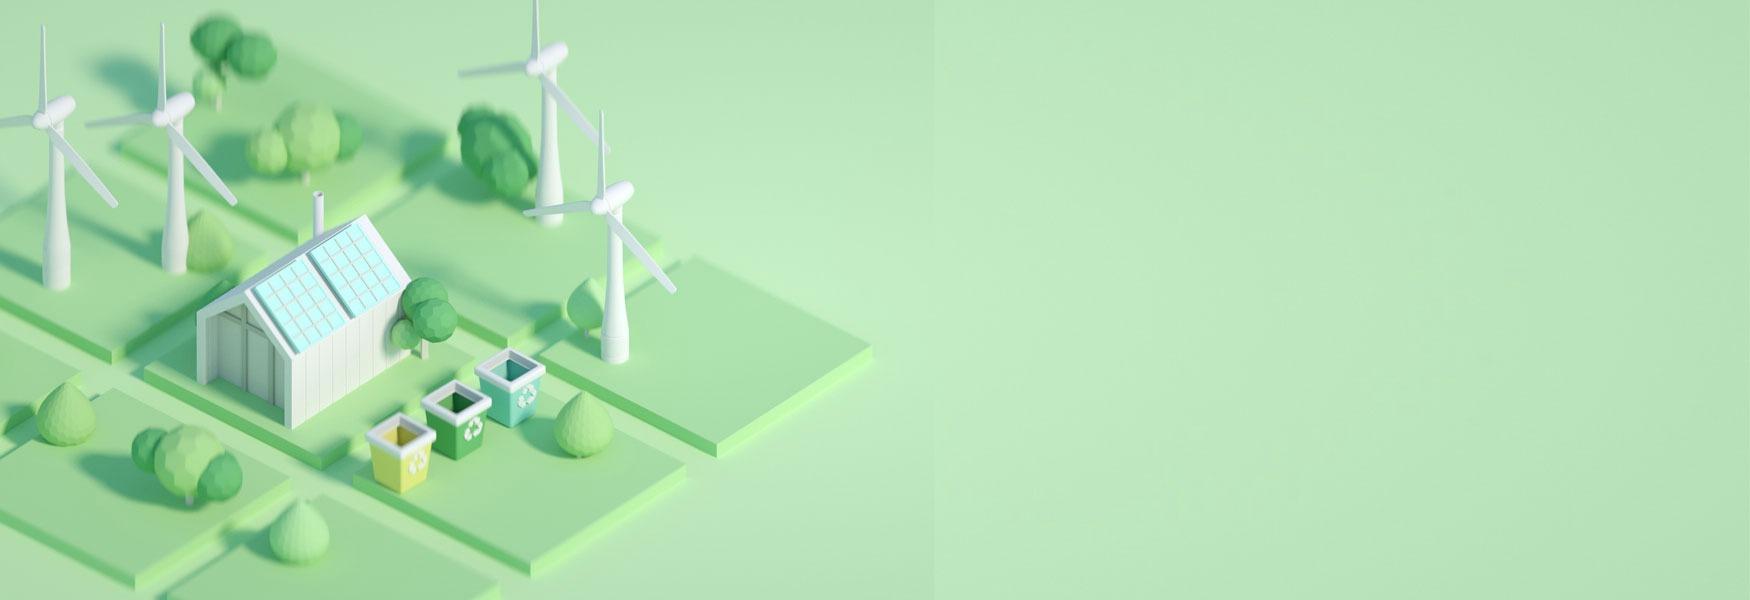 cos'è green marketing